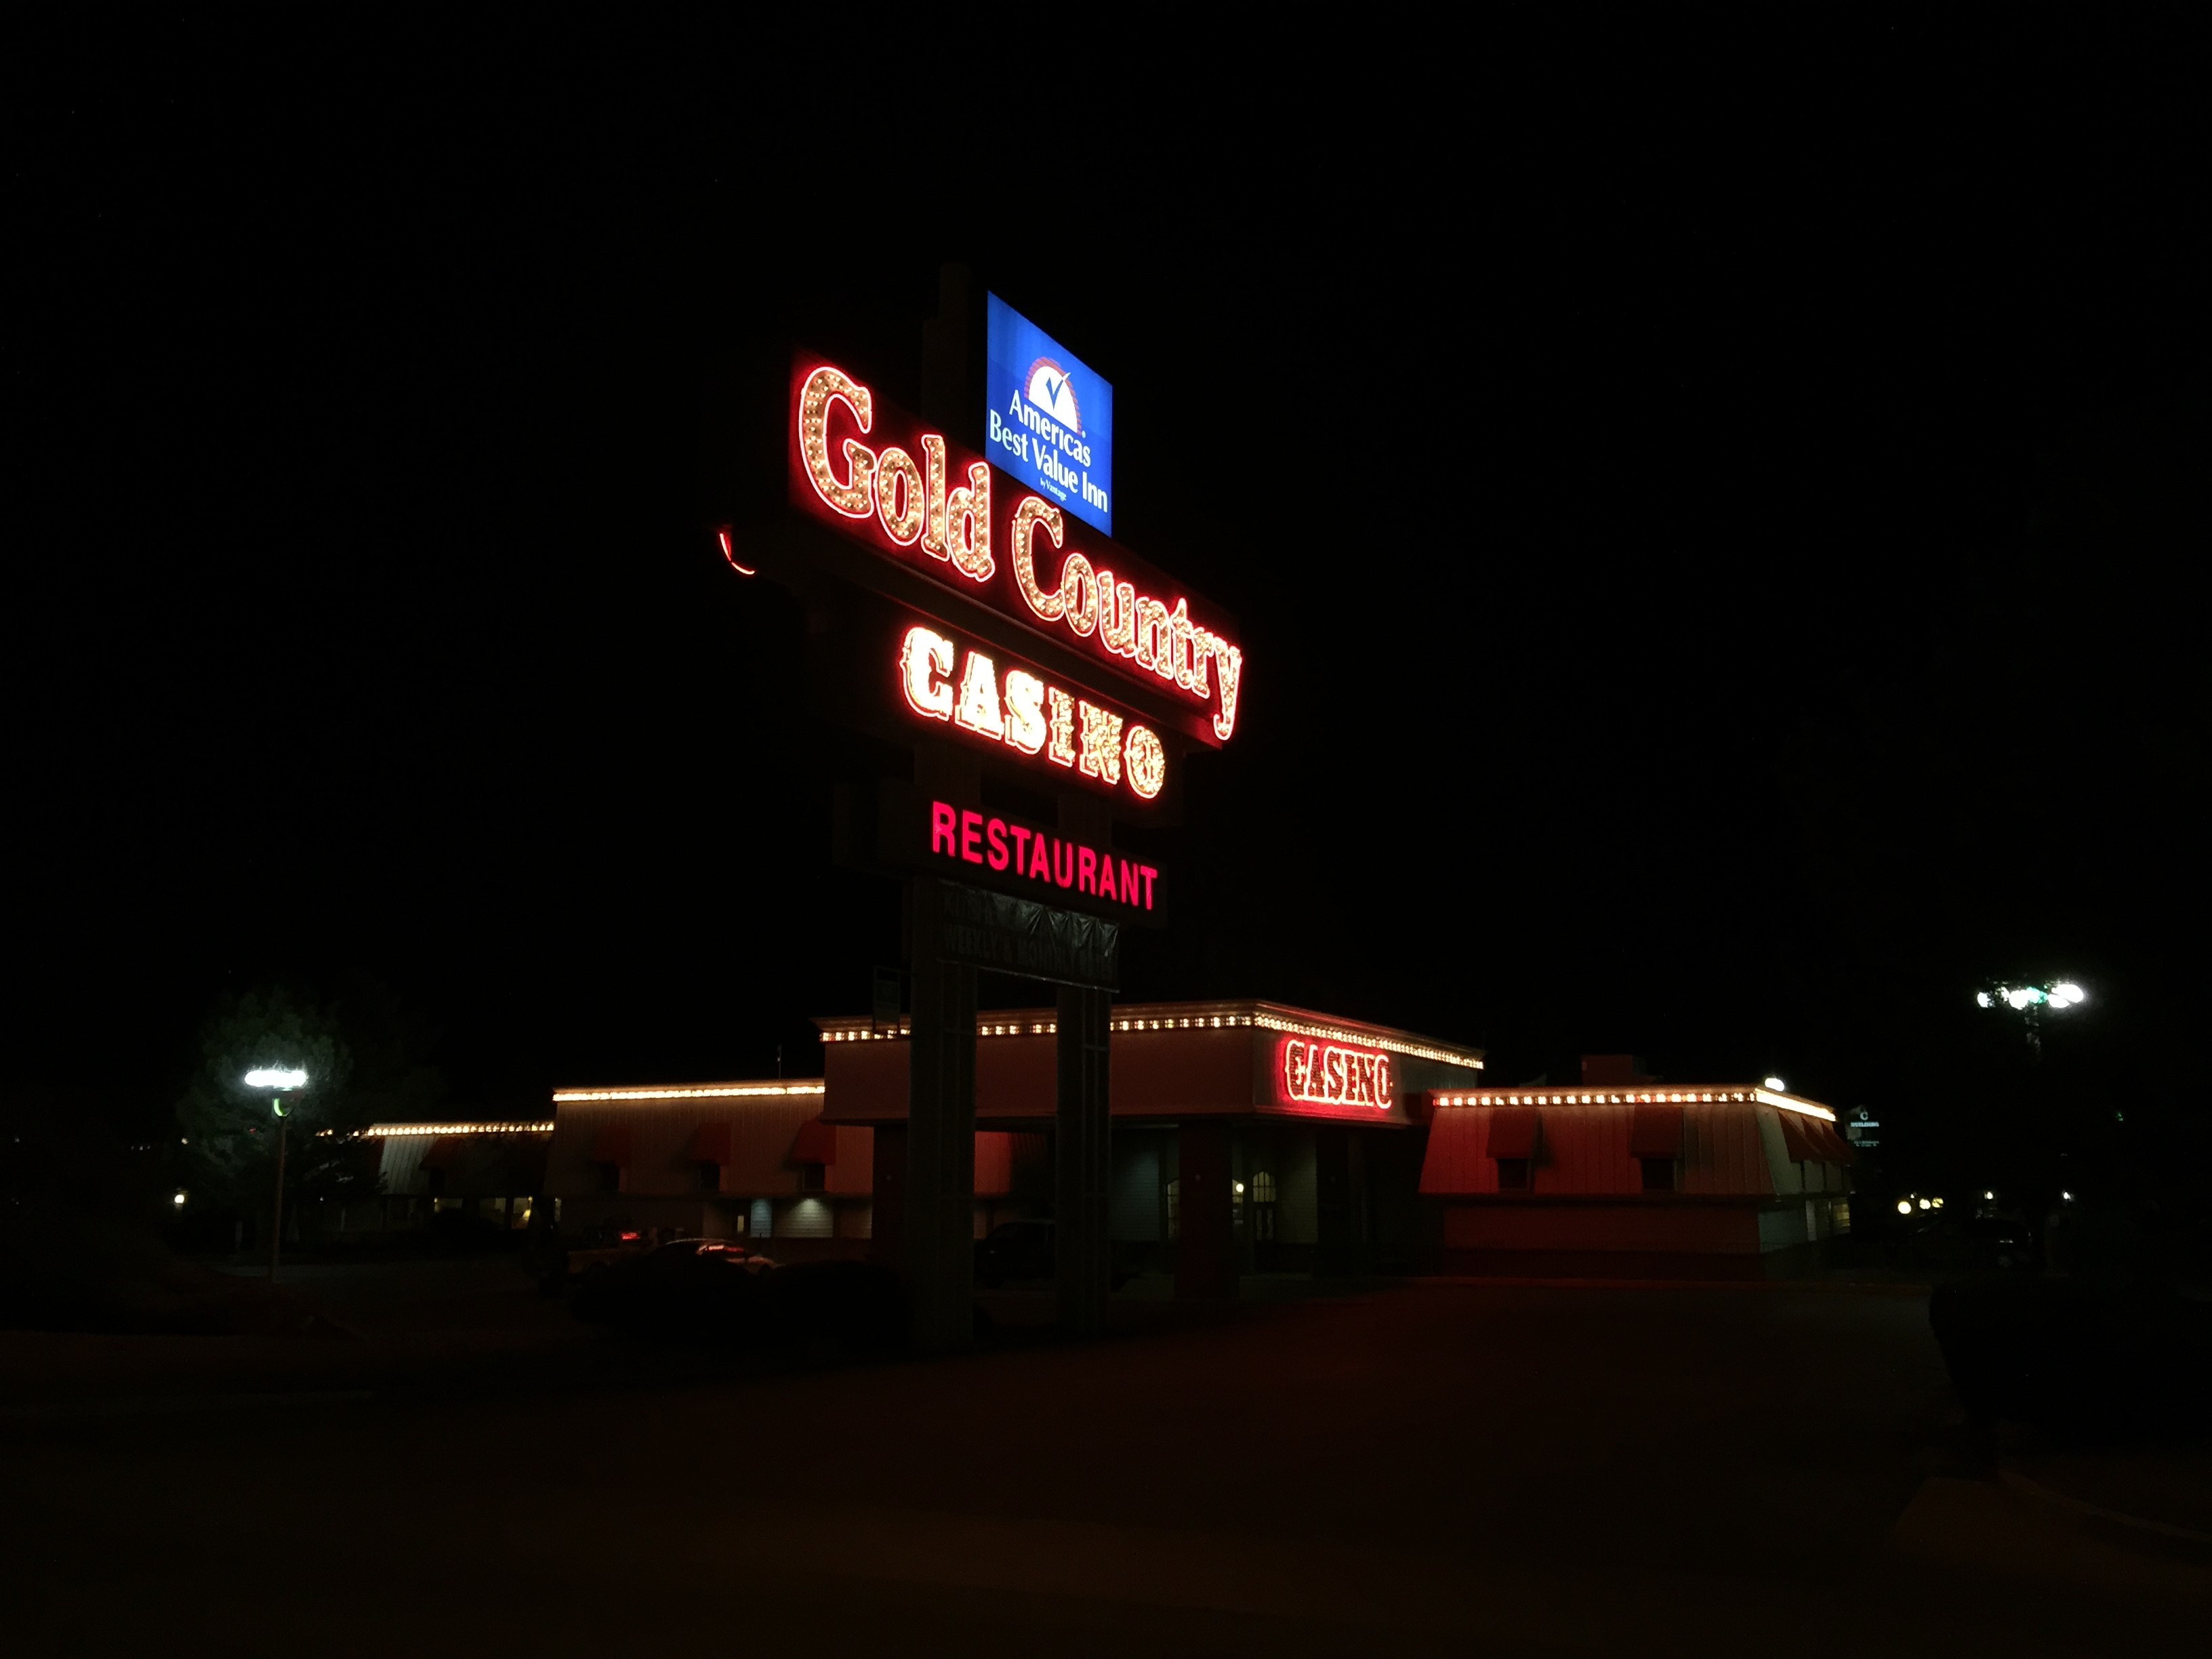 Gold country casino history casino jobs in dublin